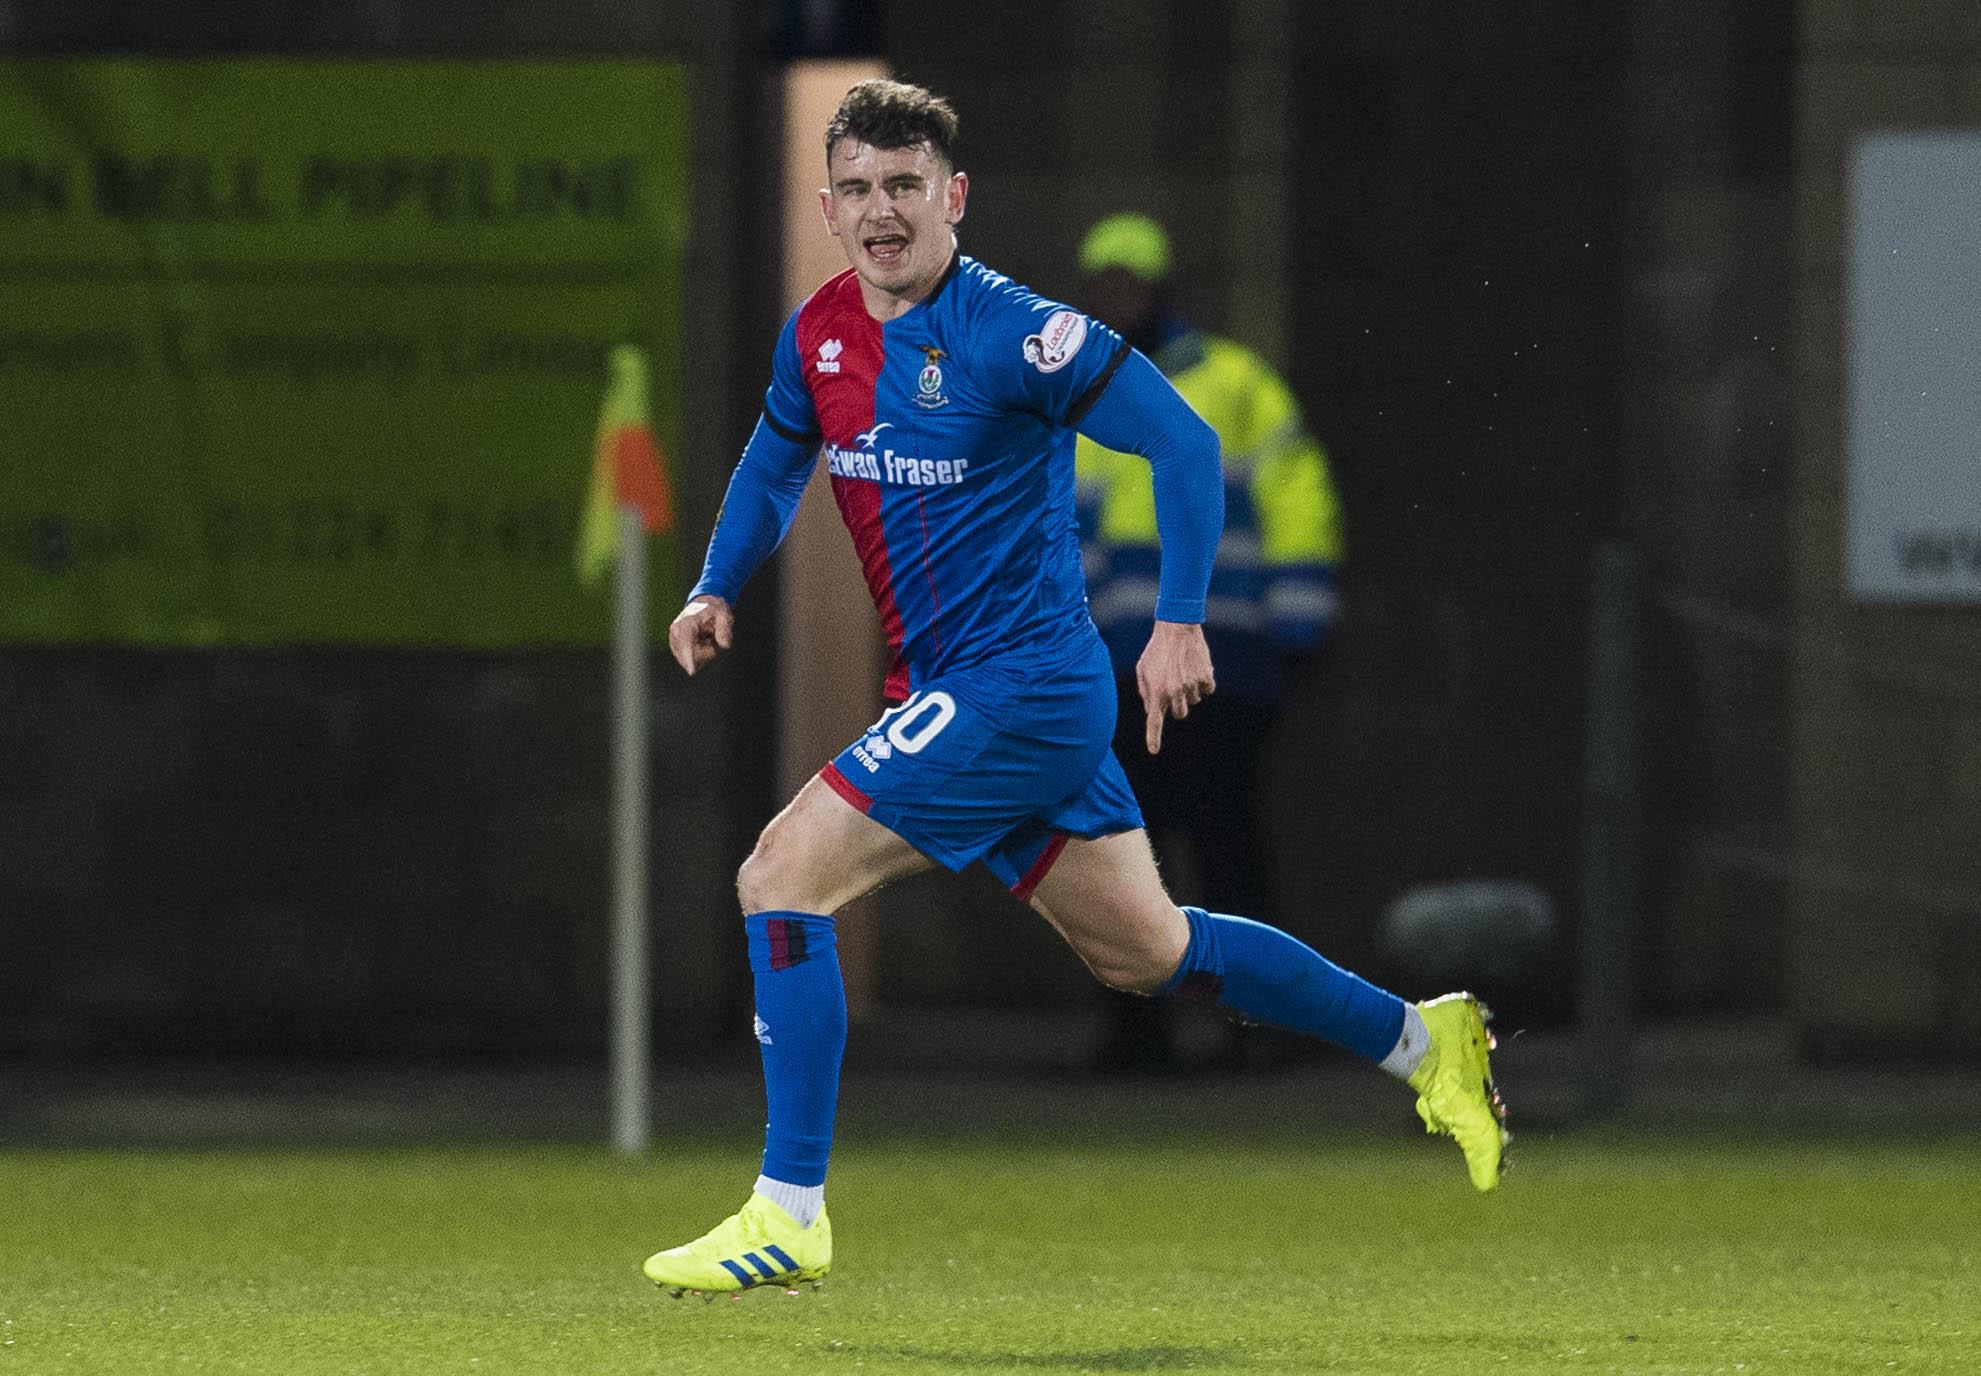 Aaron Doran scored his sixth Highland derby goal on Monday.